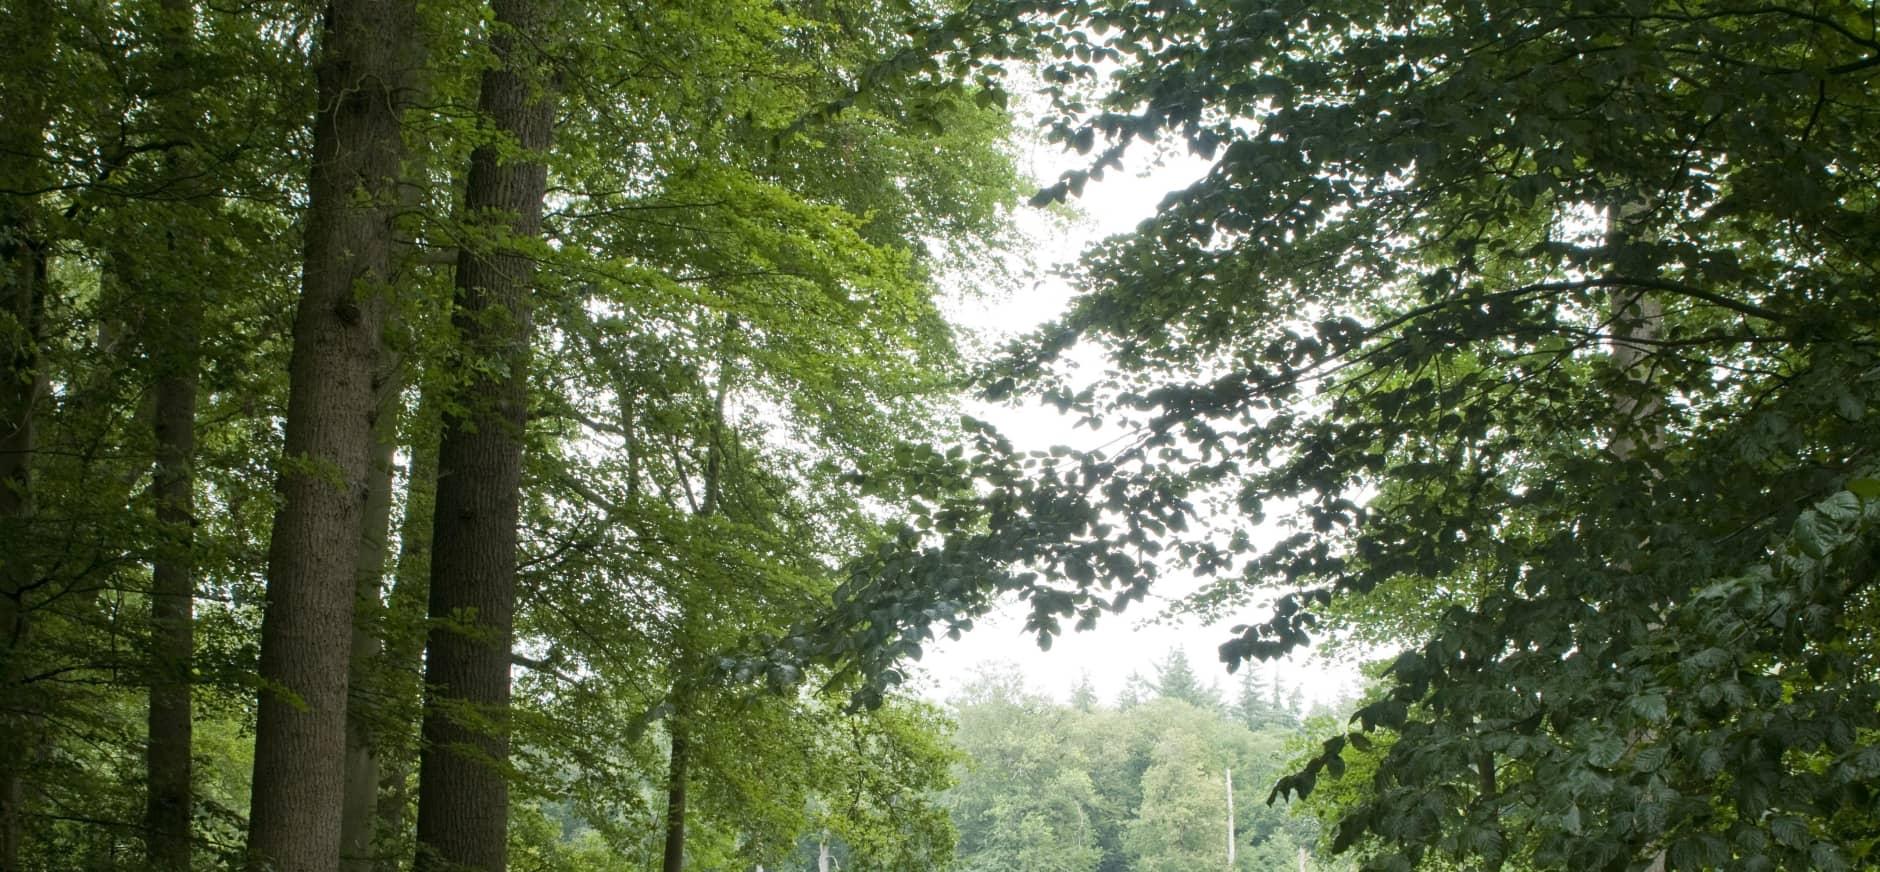 Keltische bomenroute Colckhof